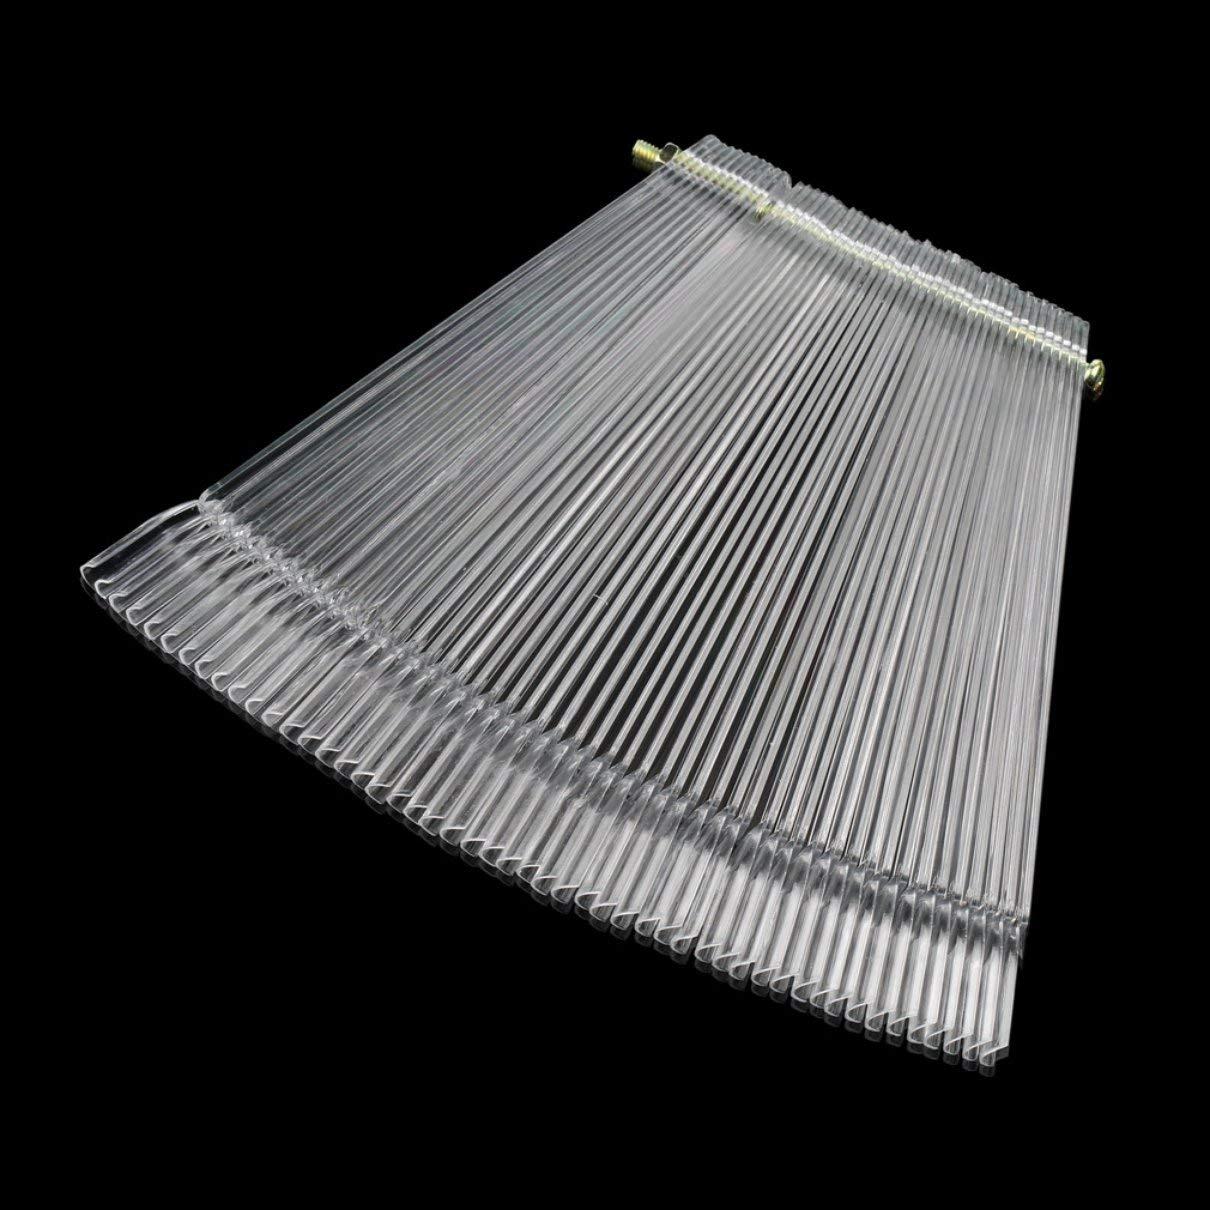 50 Piece Transparent False Nail Art Tips Stick Display Practice Fan Board Nail Art Fan Wheel Polish Tip Sticks Bellaluee